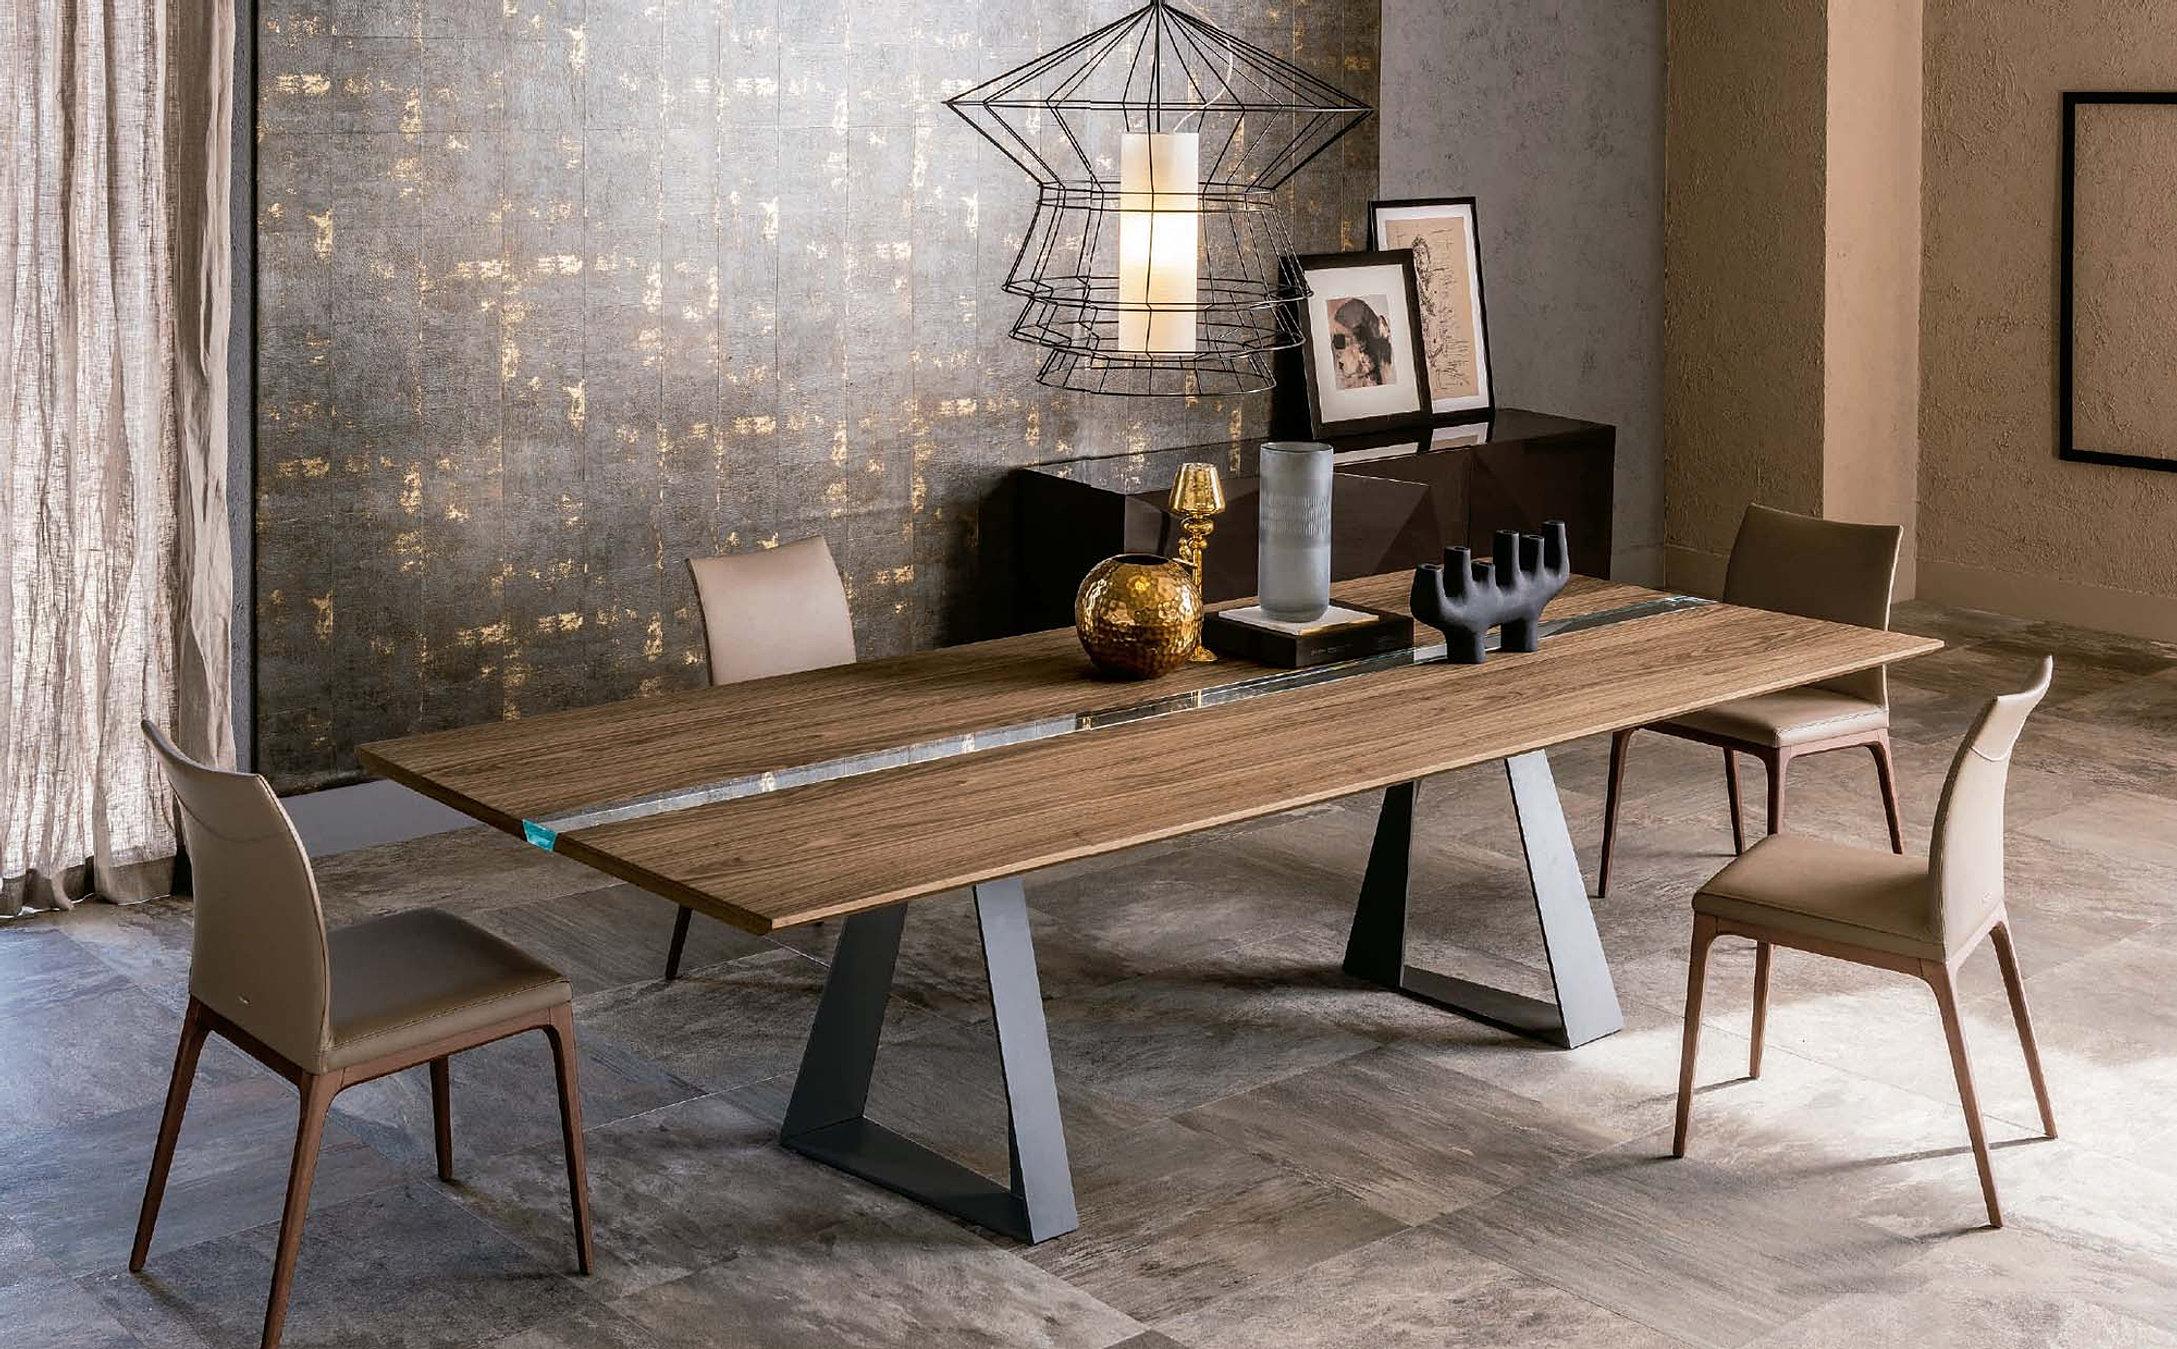 Mesas de comedor modernas muebles monen madrid - Muebles anos 50 madrid ...